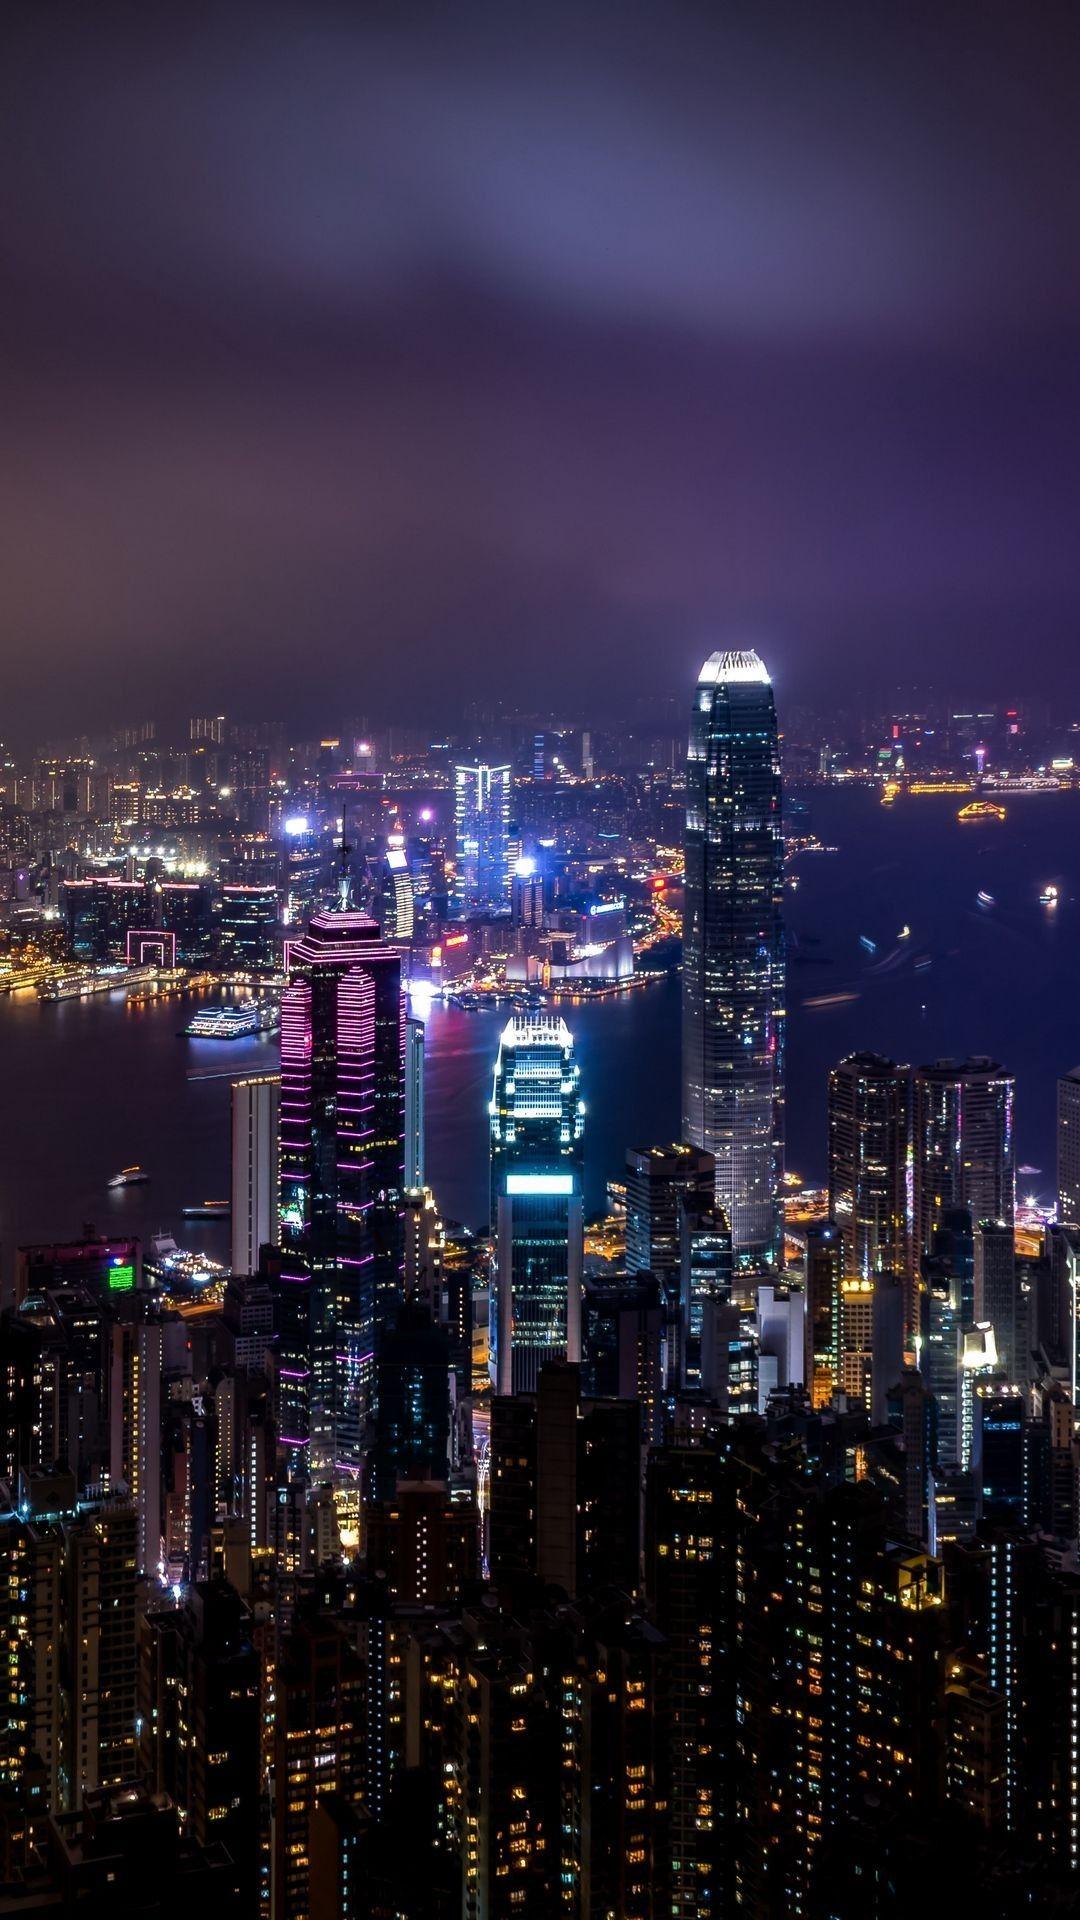 Fresh City Night View Wallpaper City Lights Wallpaper City Wallpaper China City